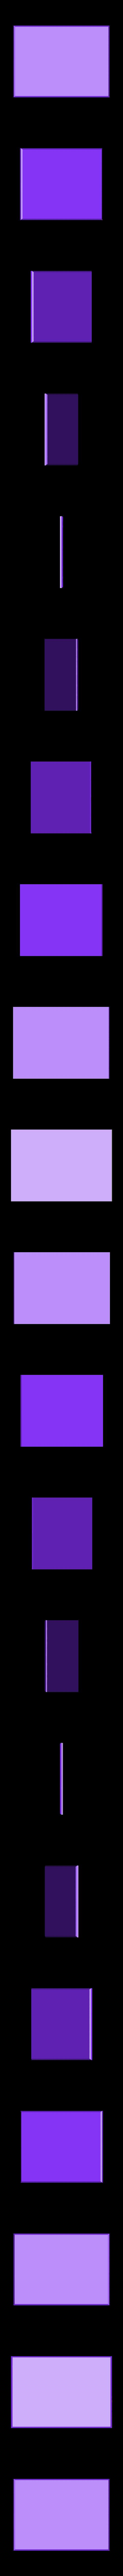 r_base.stl Download free STL file Saxon Barn 2 • 3D printing model, Earsling